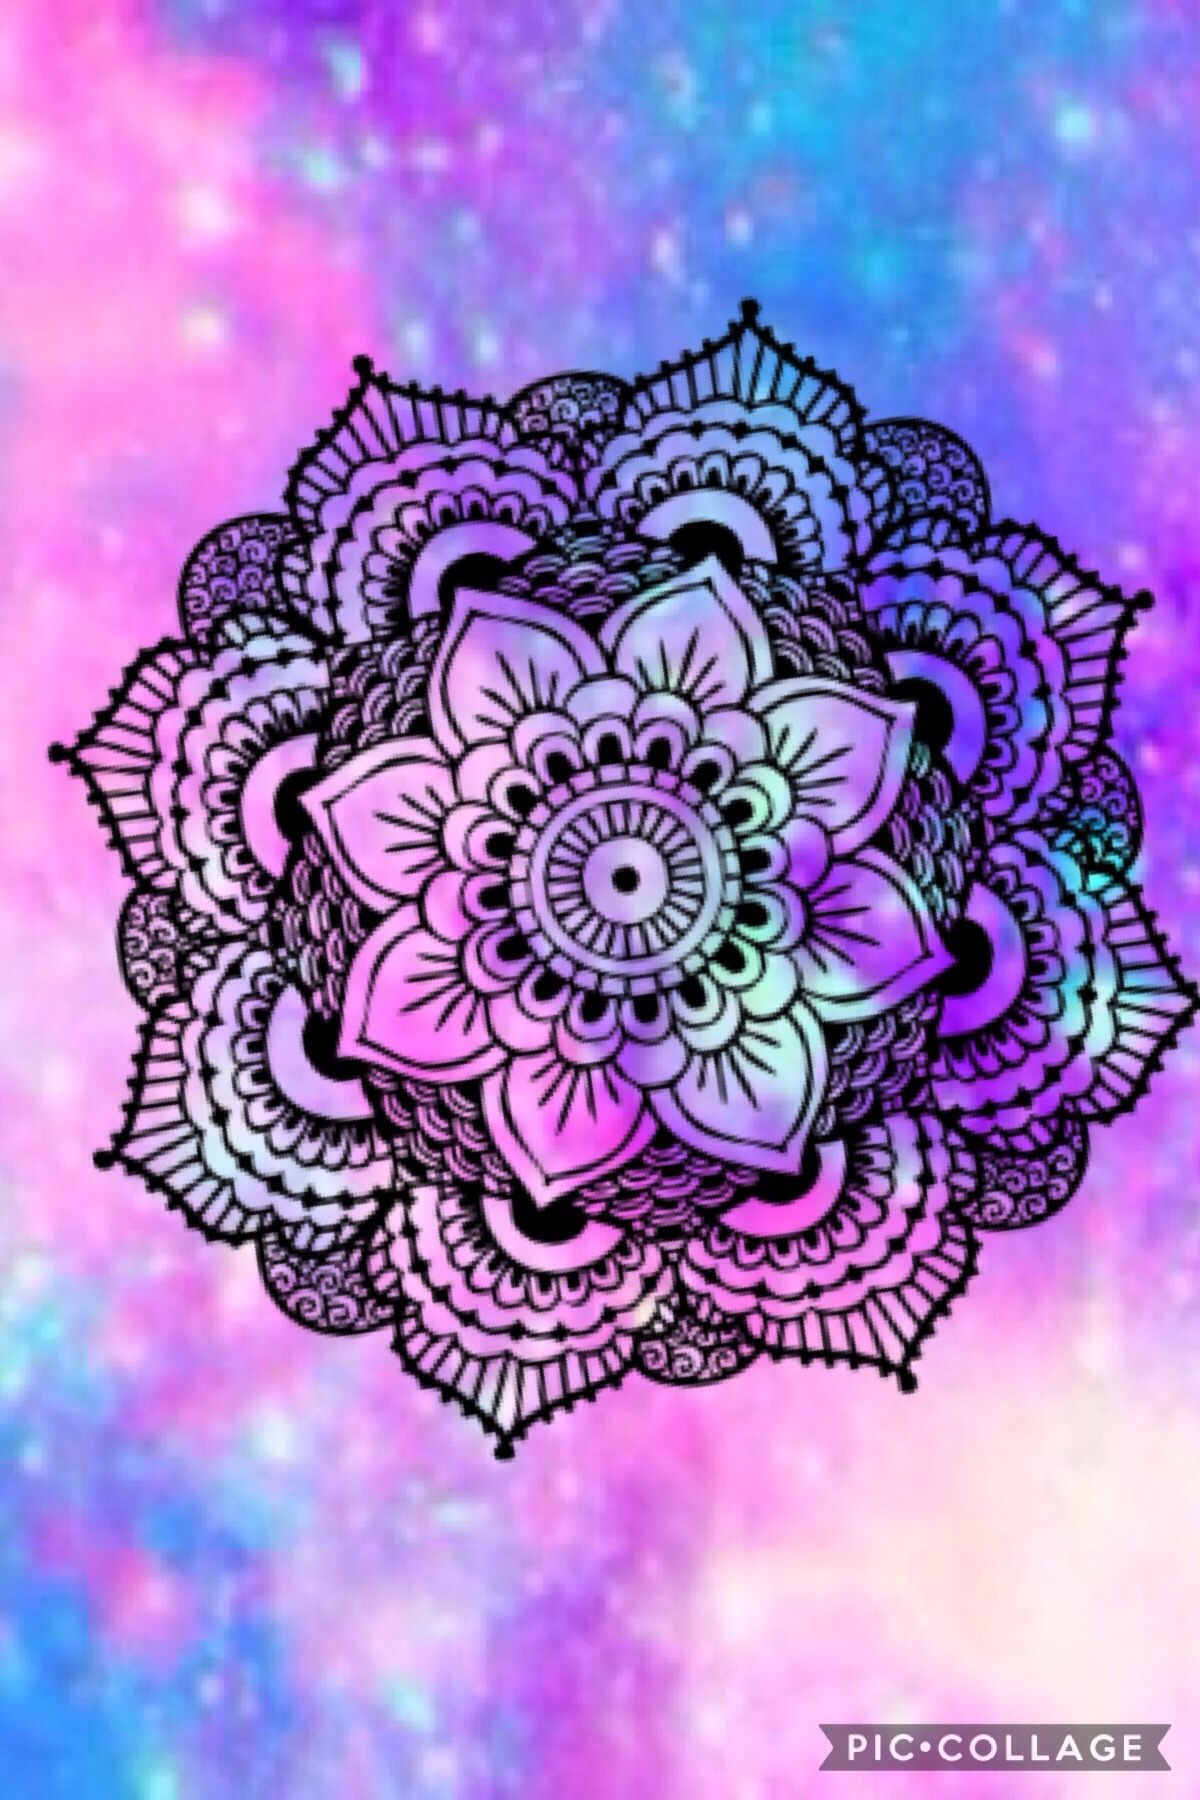 Cute Pink Owl Wallpaper For Iphone Manda La Hermosa Lipi Pinterest Mandala Wallpaper